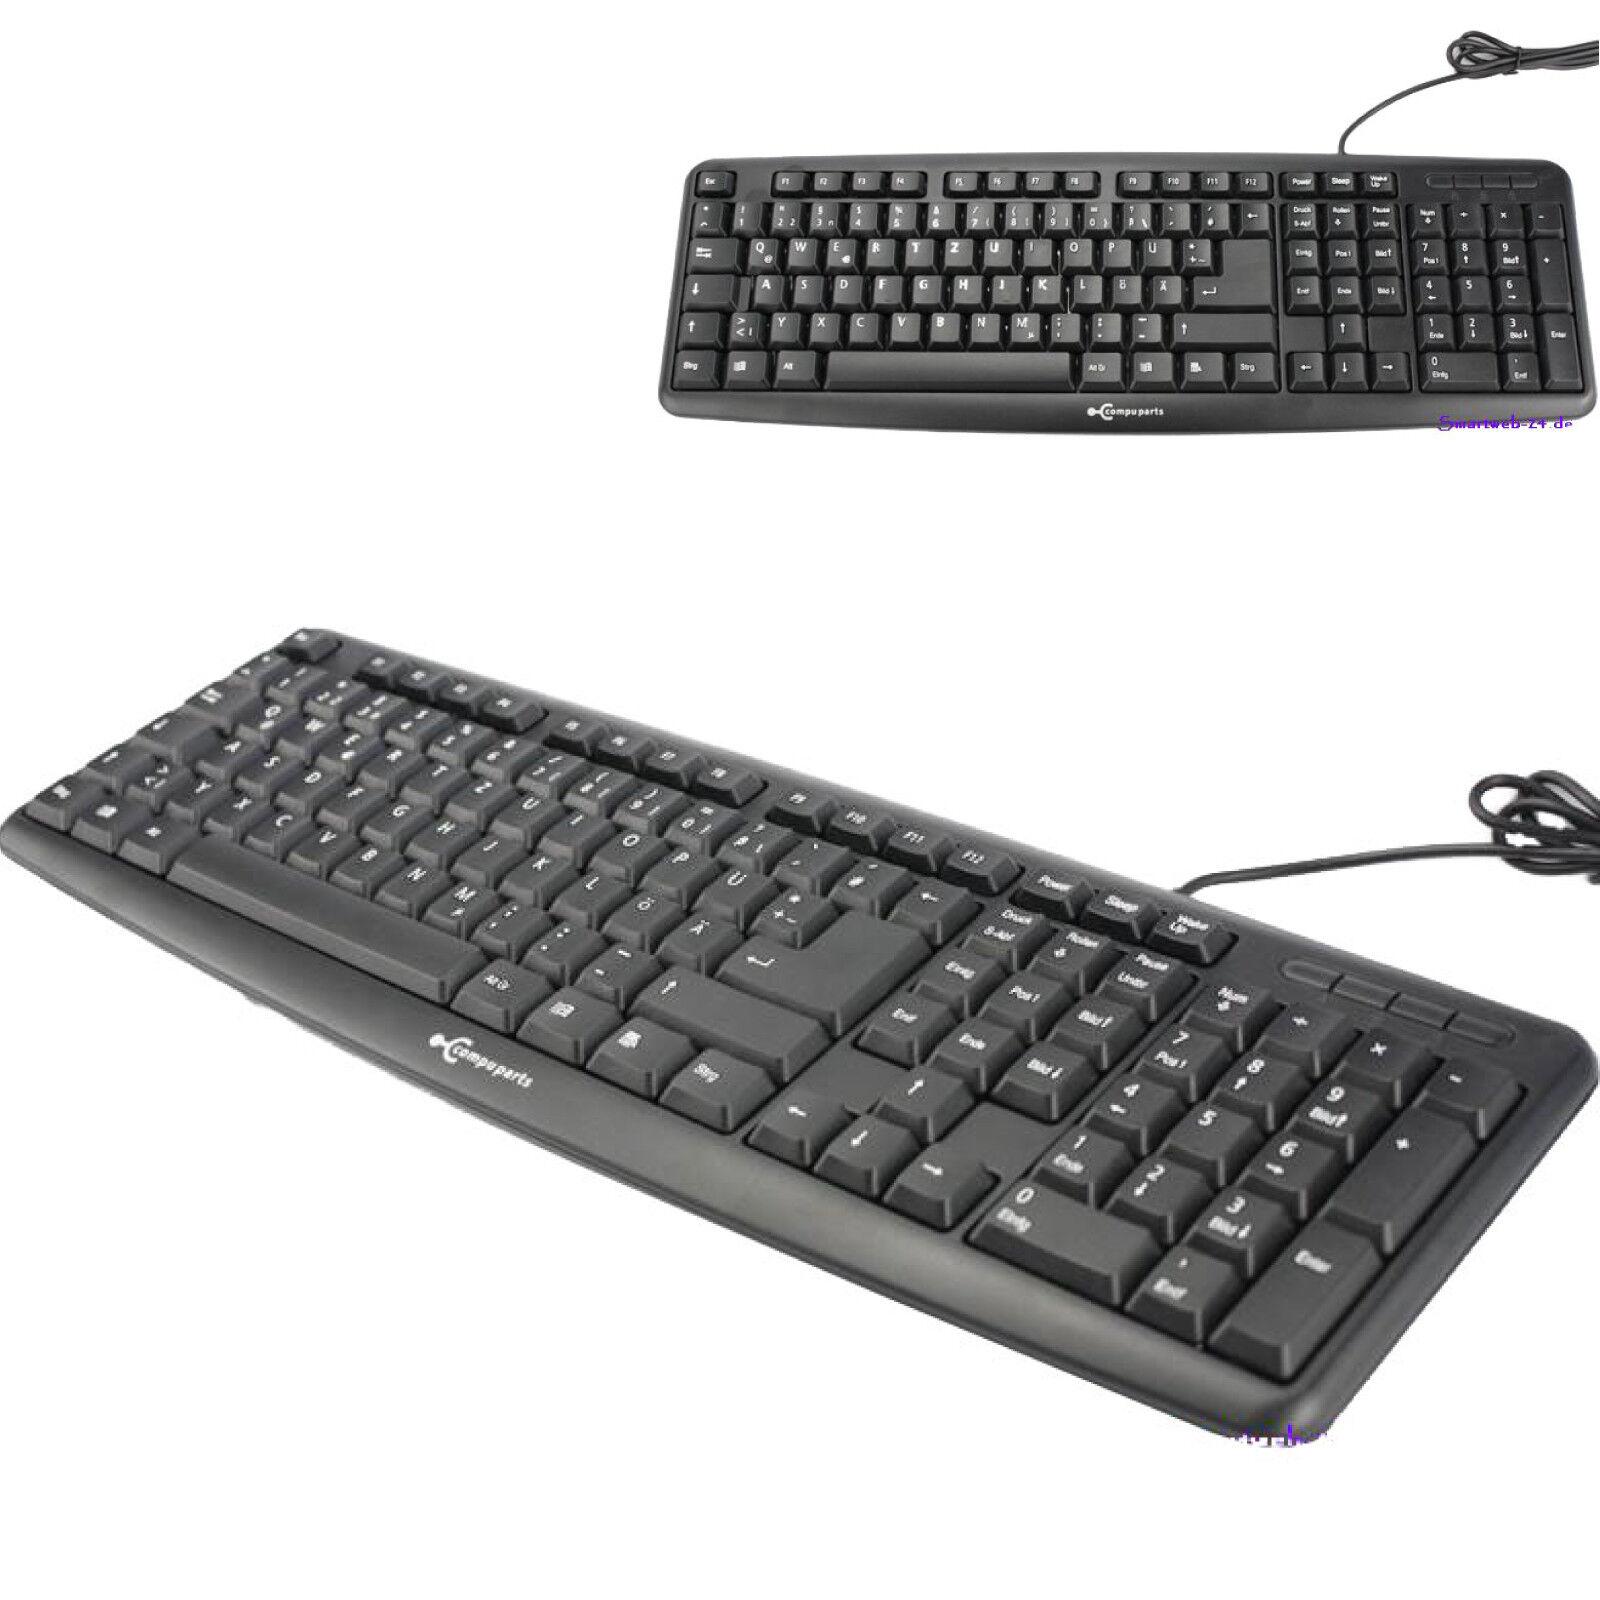 Pc Tastatur Verstellt